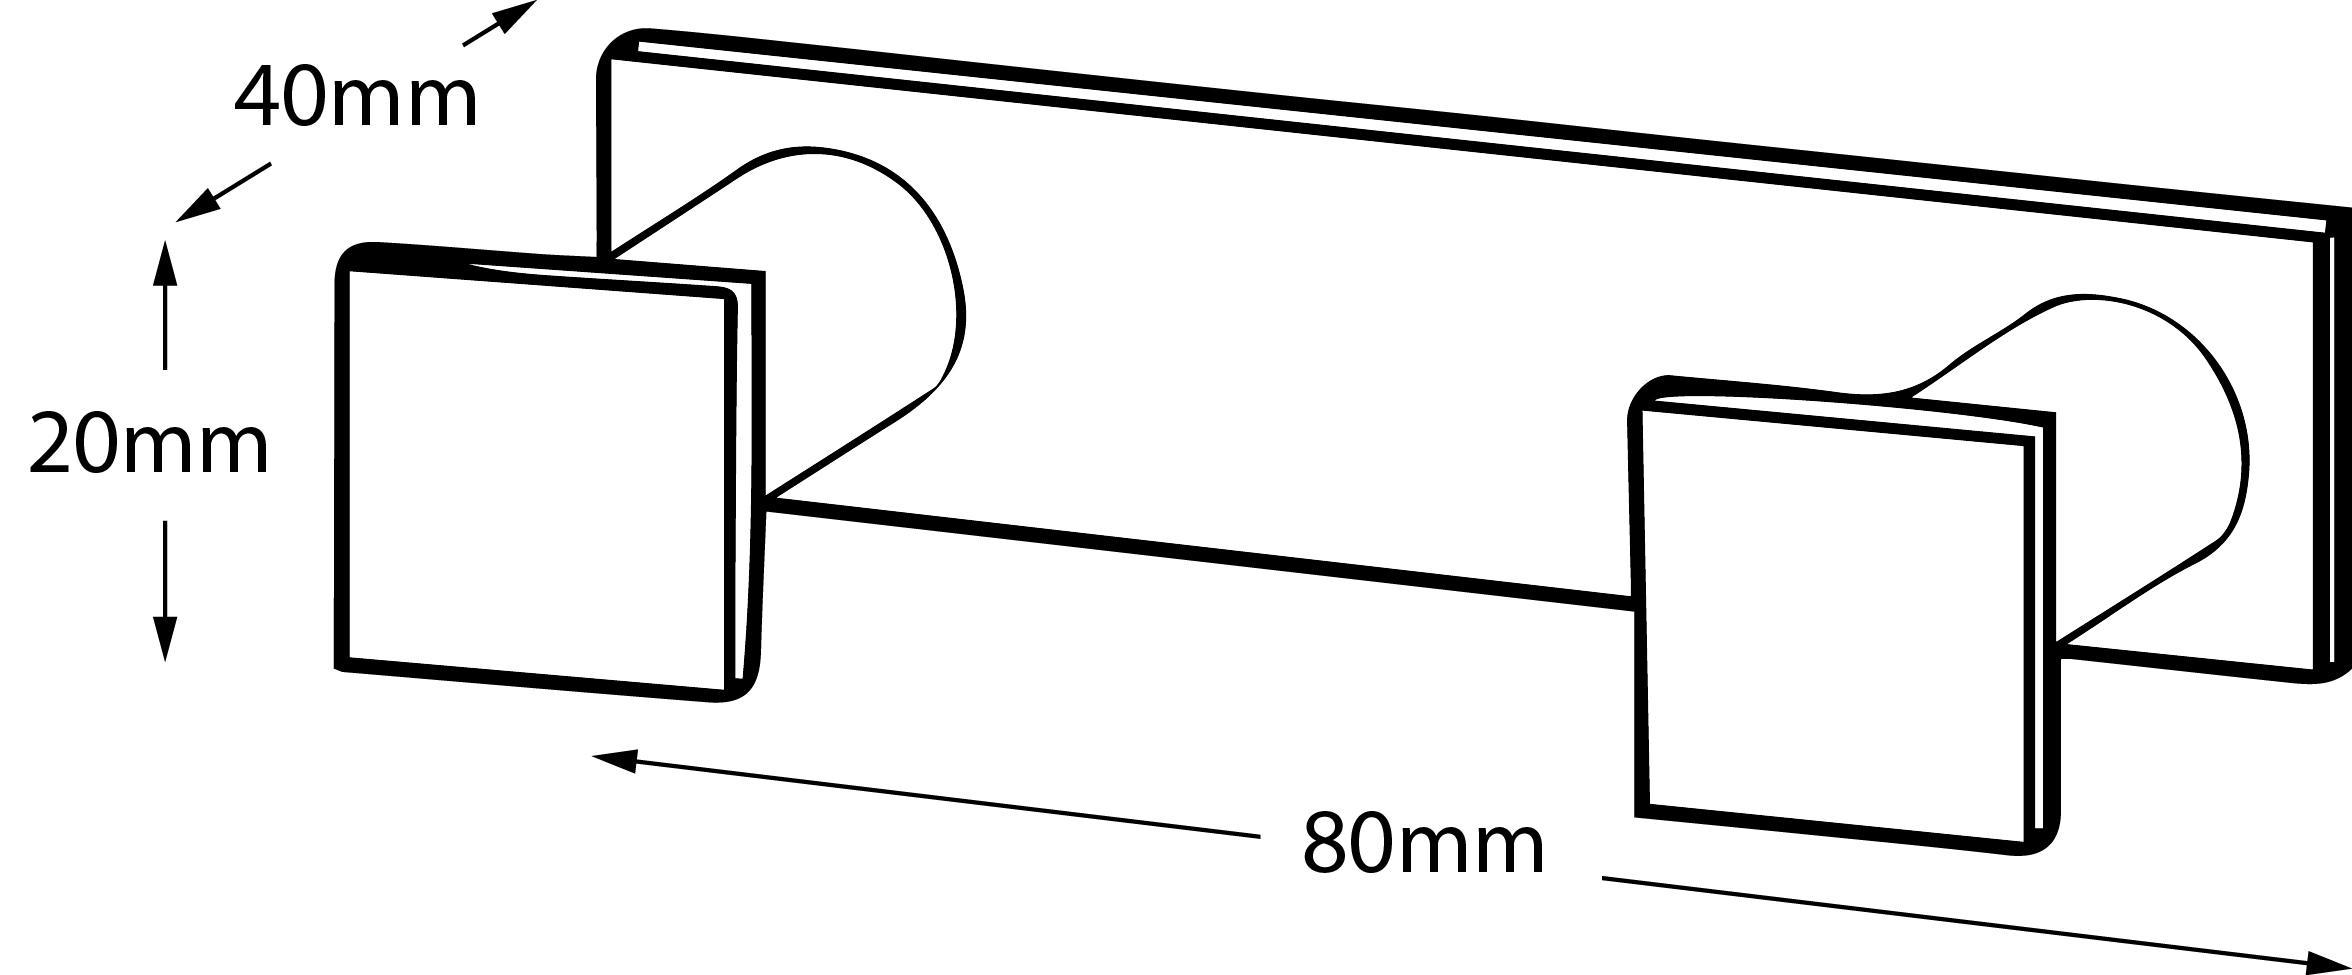 Metric Double Robe Hook